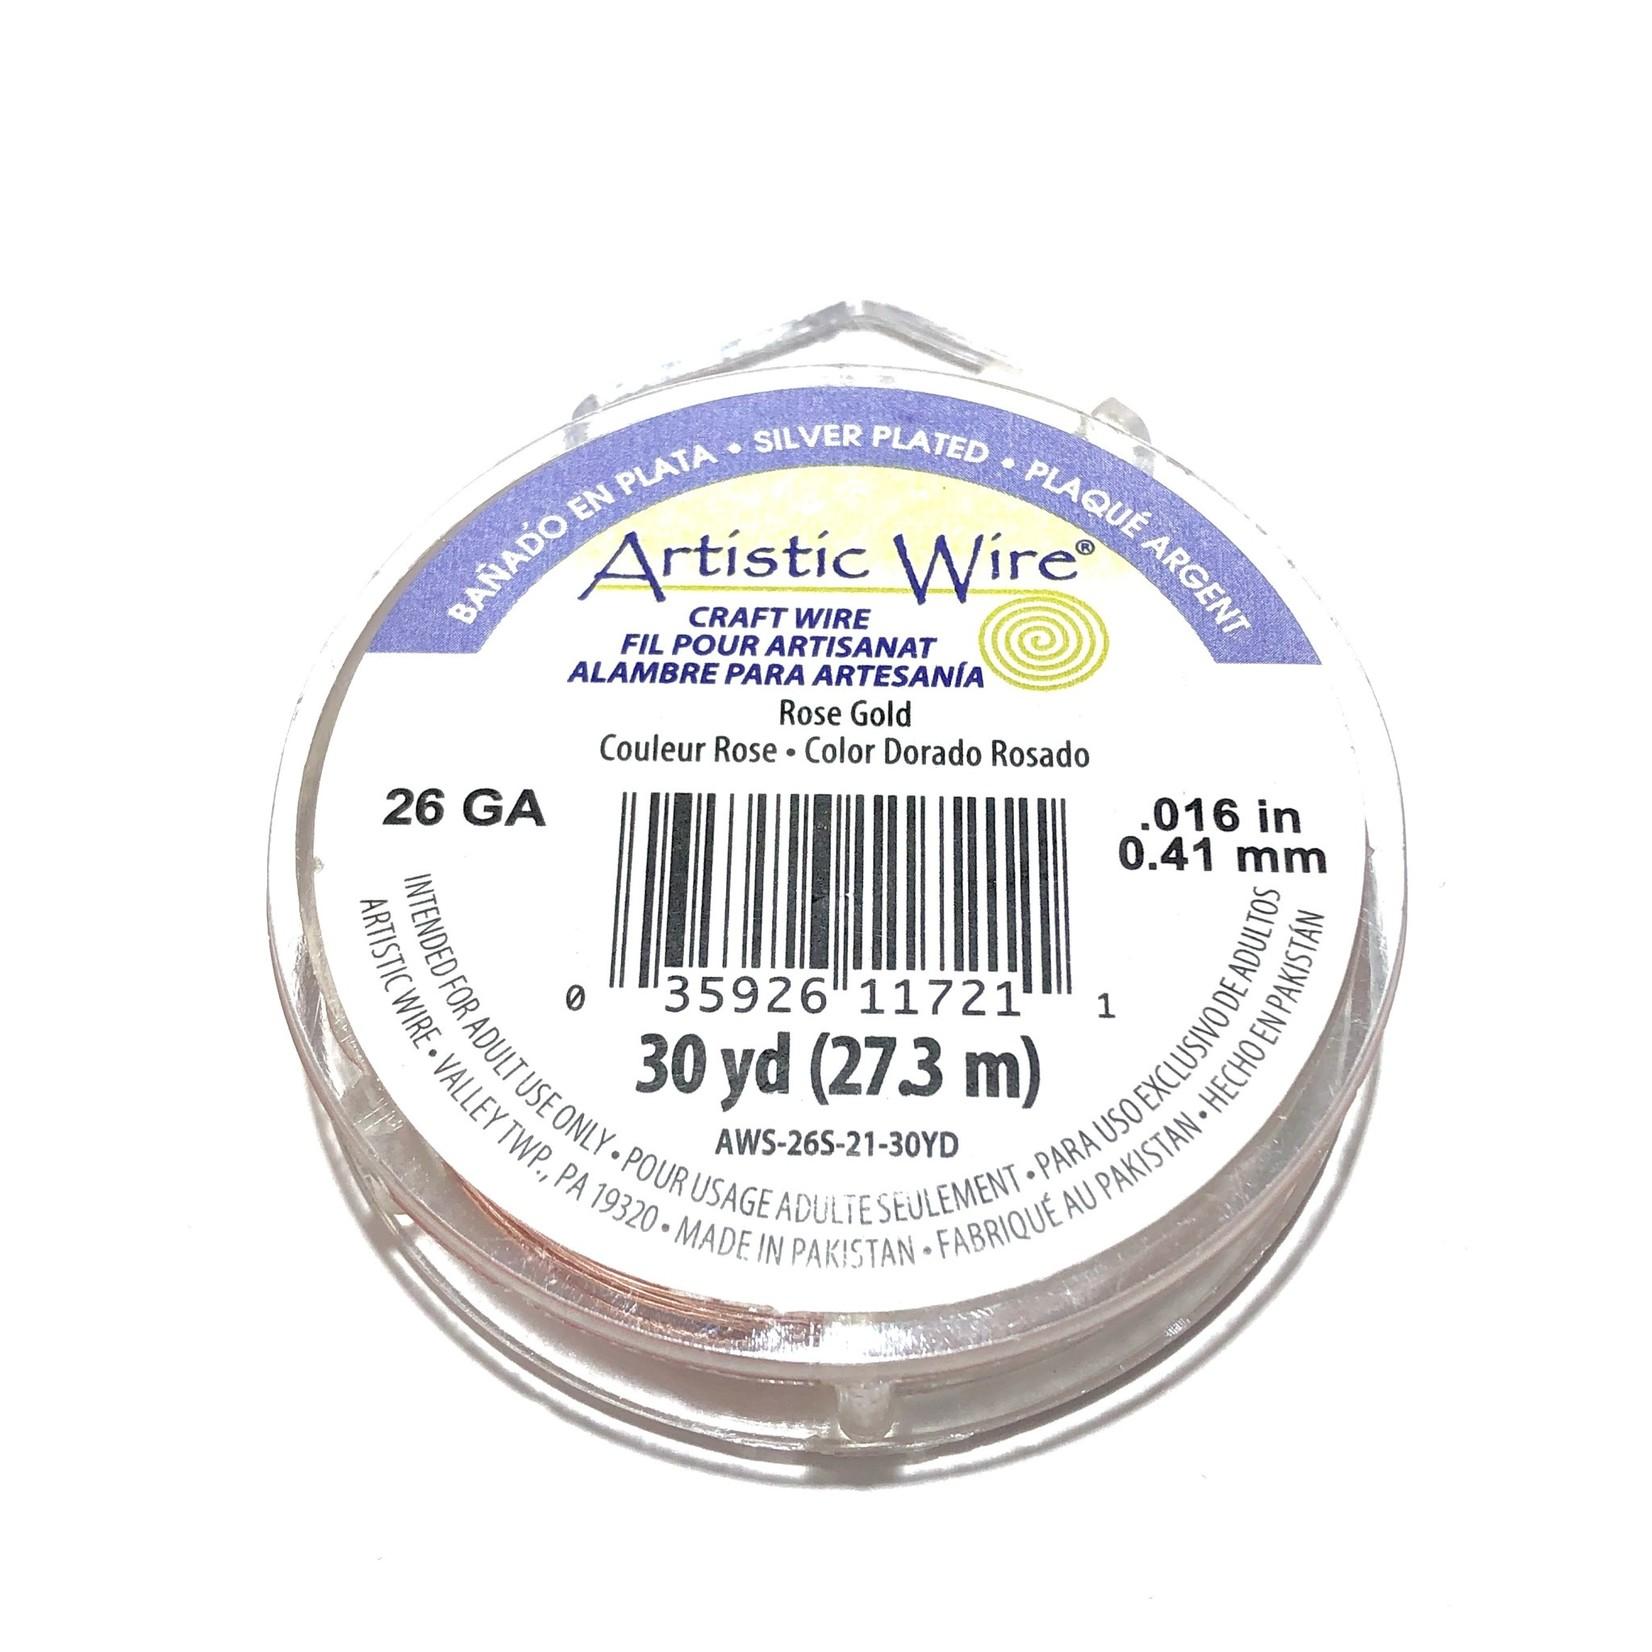 Artistic Wire Rose Gold Colour 26Ga 30Yd